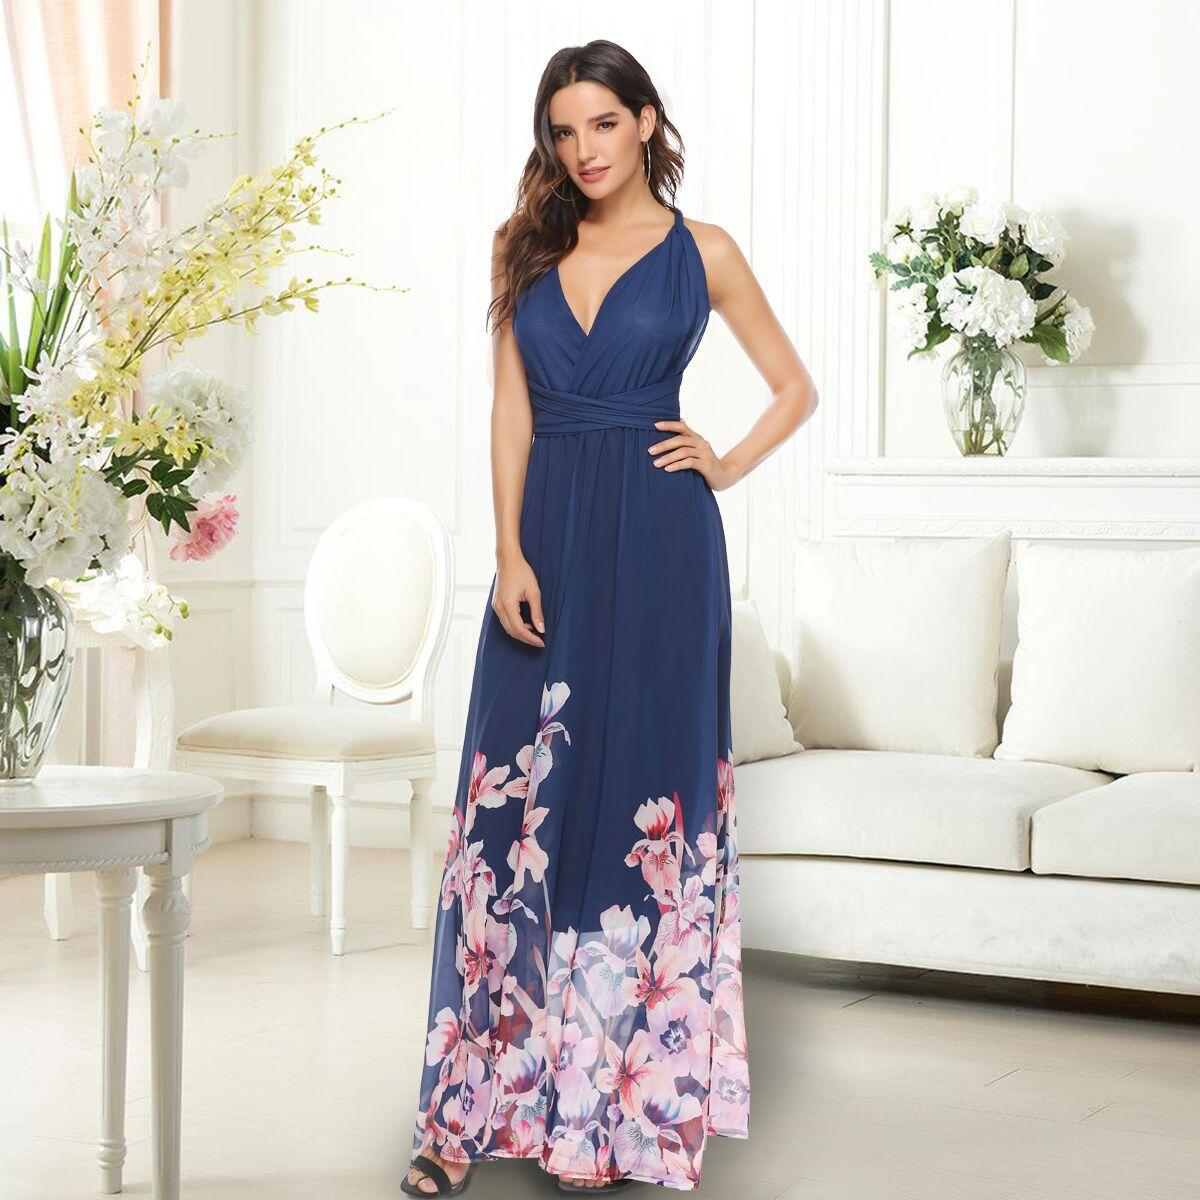 Ladies Summer Beach Party Sundress Long Womens Holiday Print Deep V-Neck Boho Strappy Maxi Dress